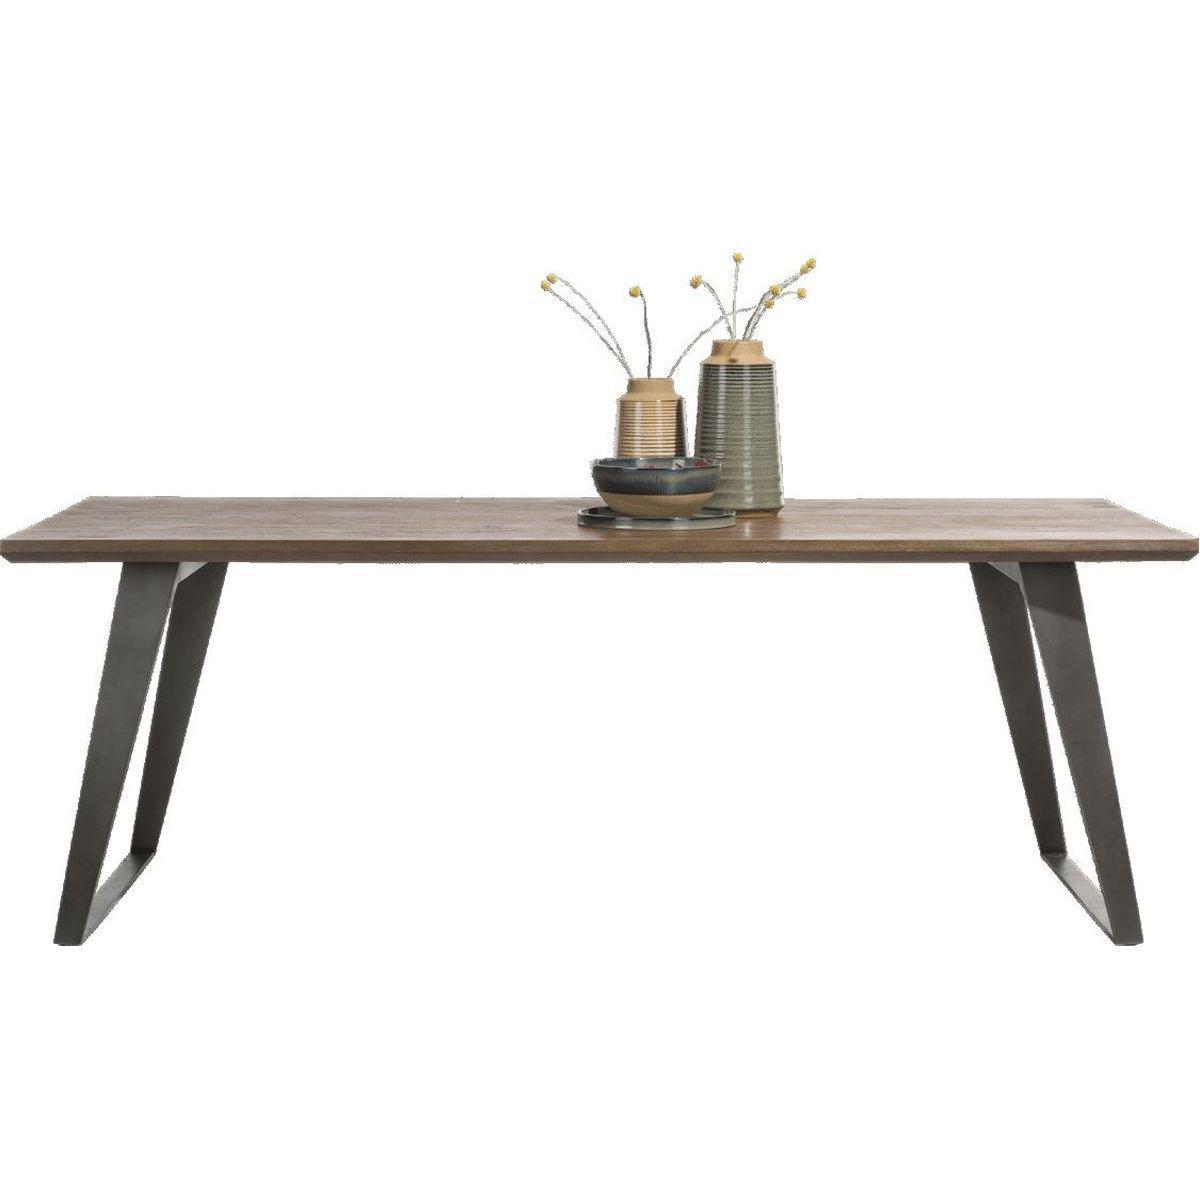 Table BOX HetH Table 100x220cm Tramwood Walnut